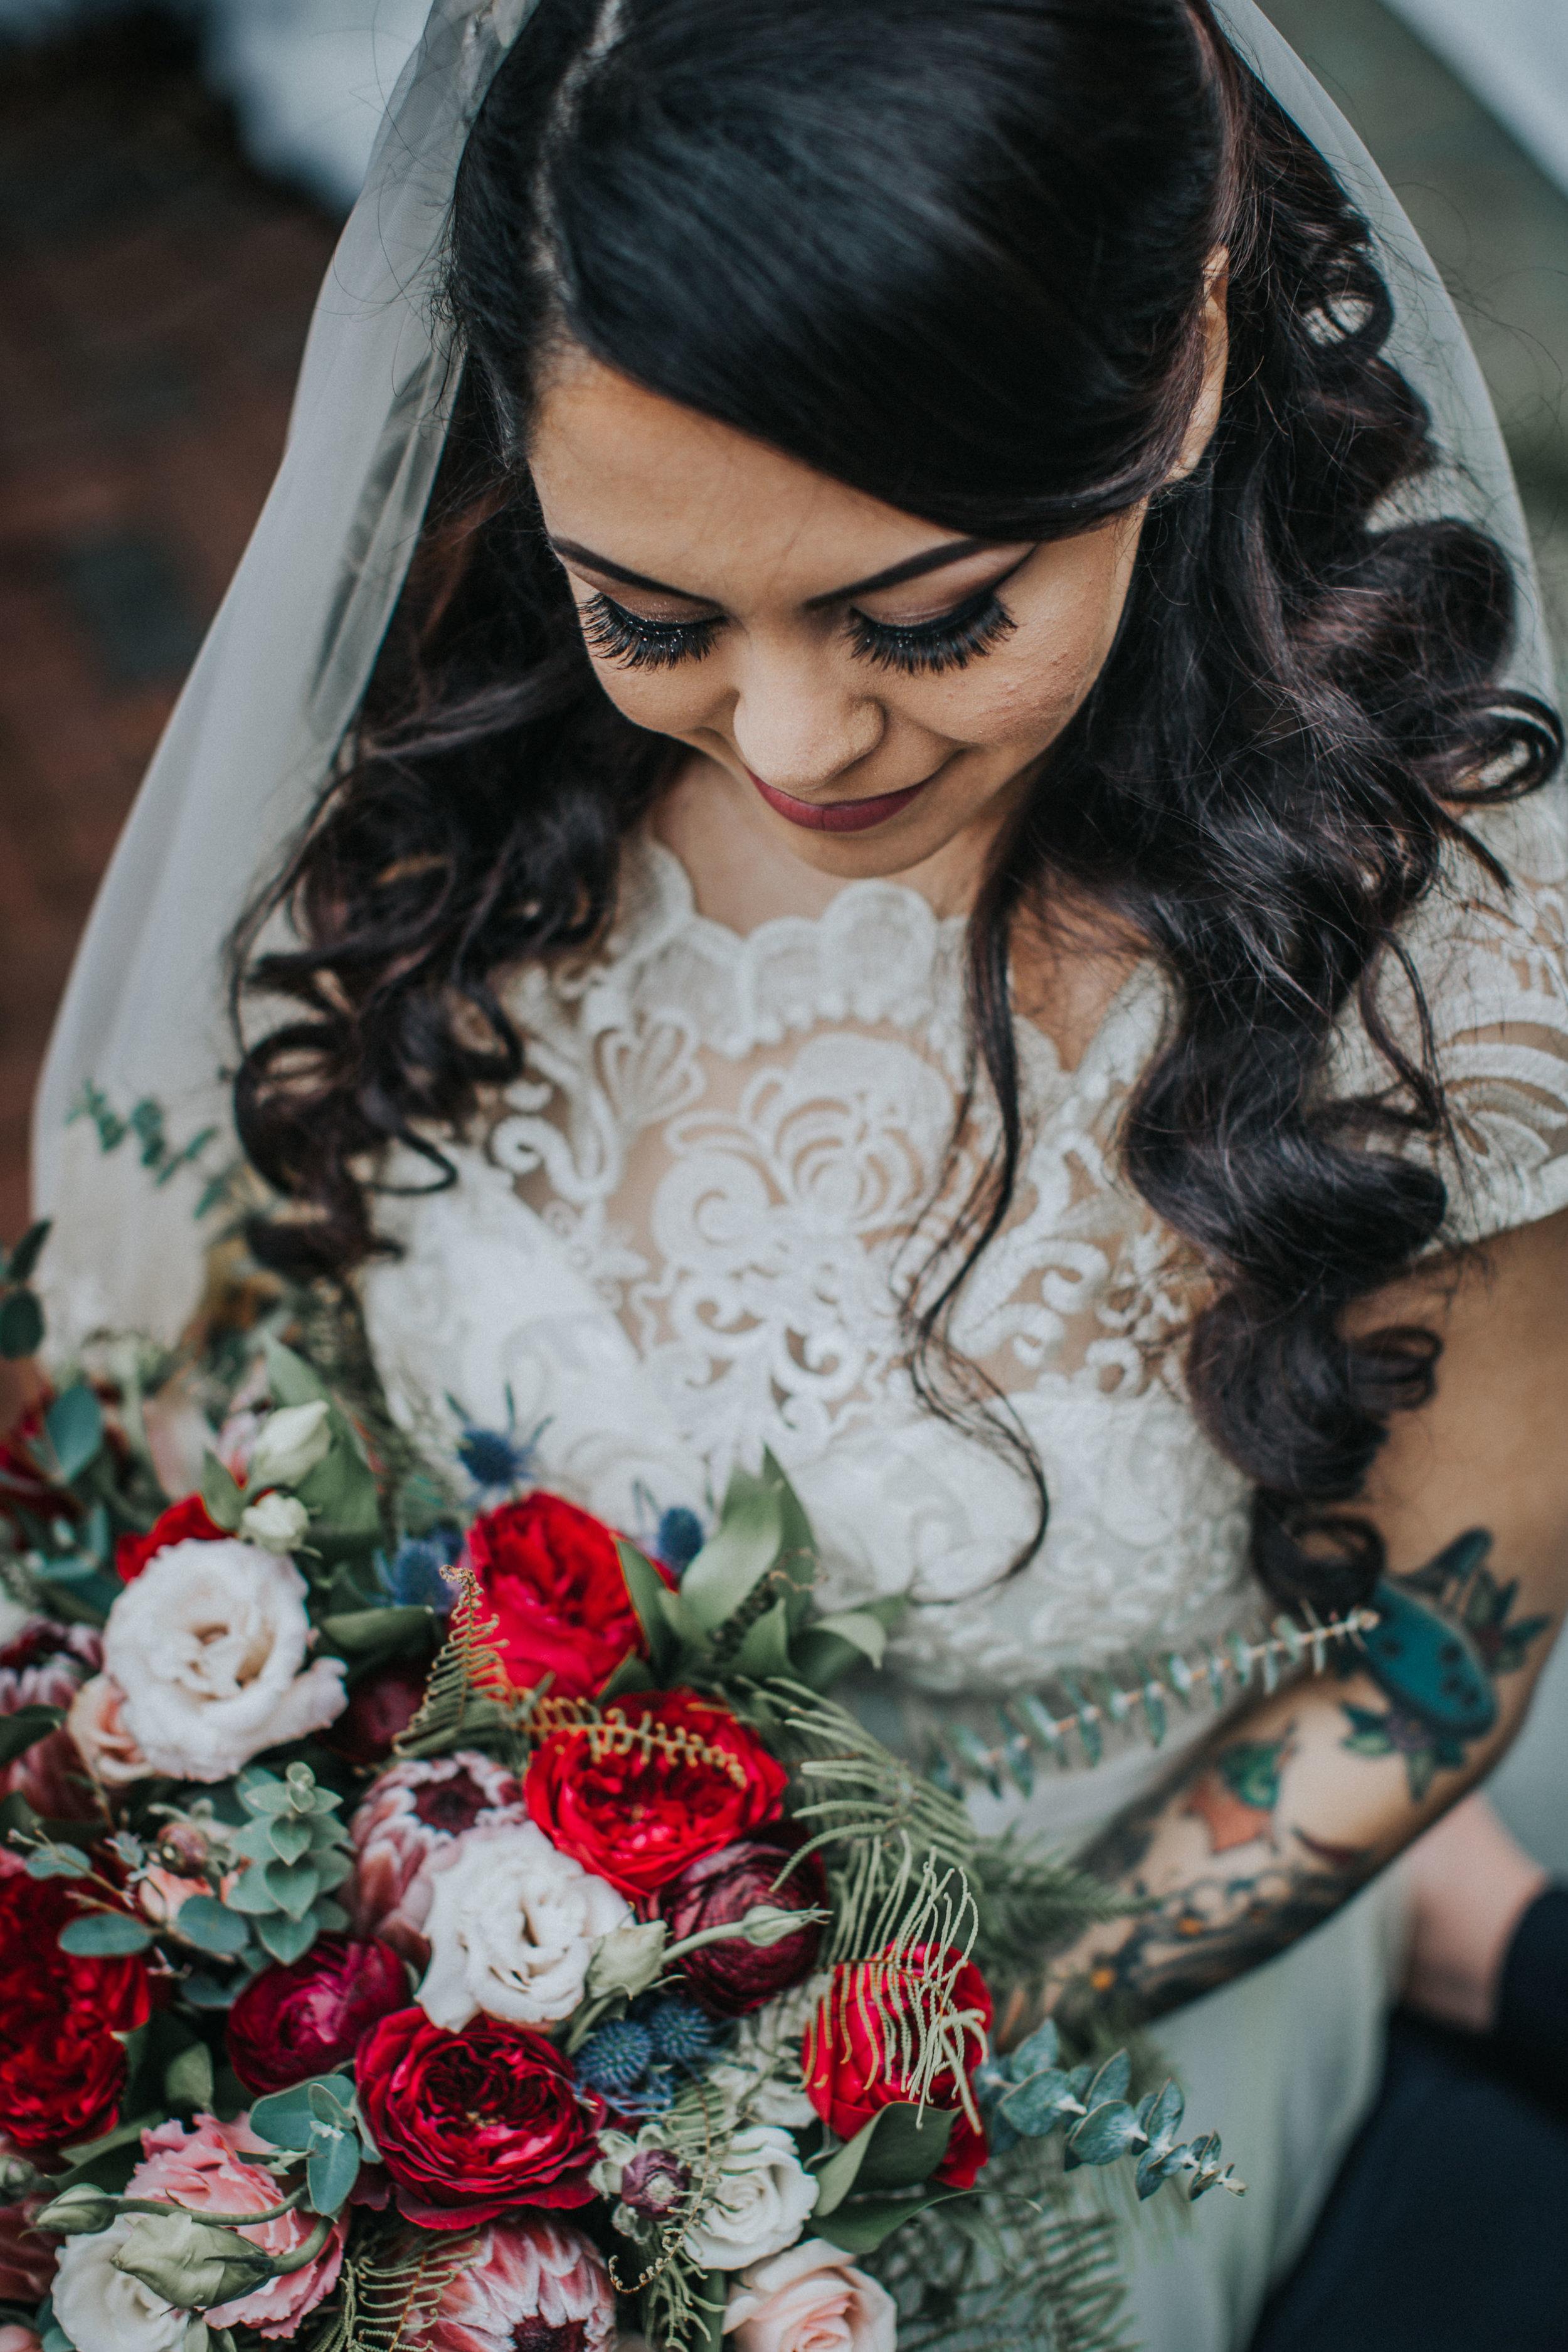 New-Jersey-Wedding-Photographer-ReceptionCenter-Valeria&Mike-First-Look-Bride&Groom (71 of 7).jpg